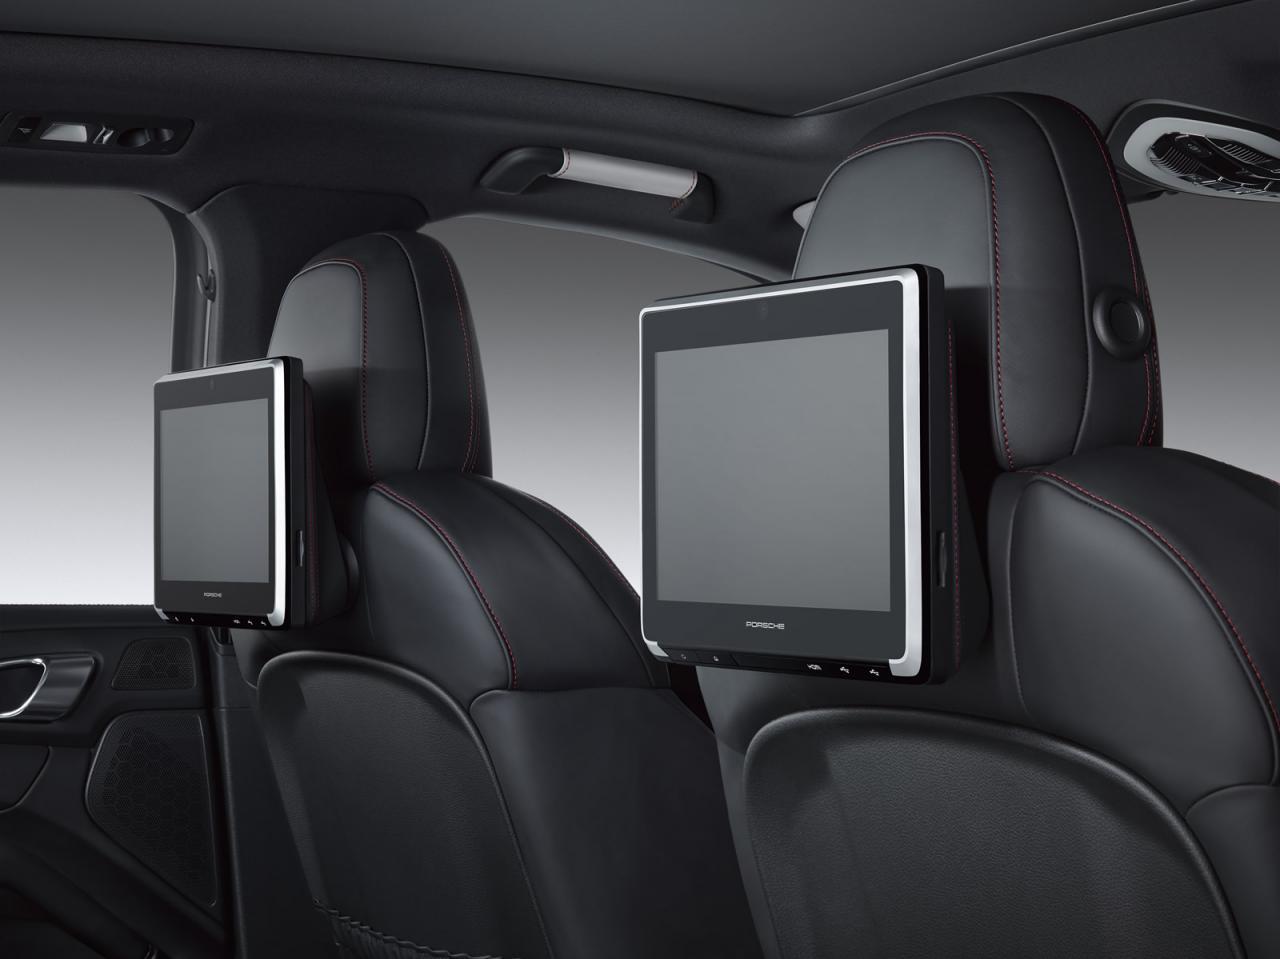 new-porsche-exclusive-rear-seat-entertainment-system-1